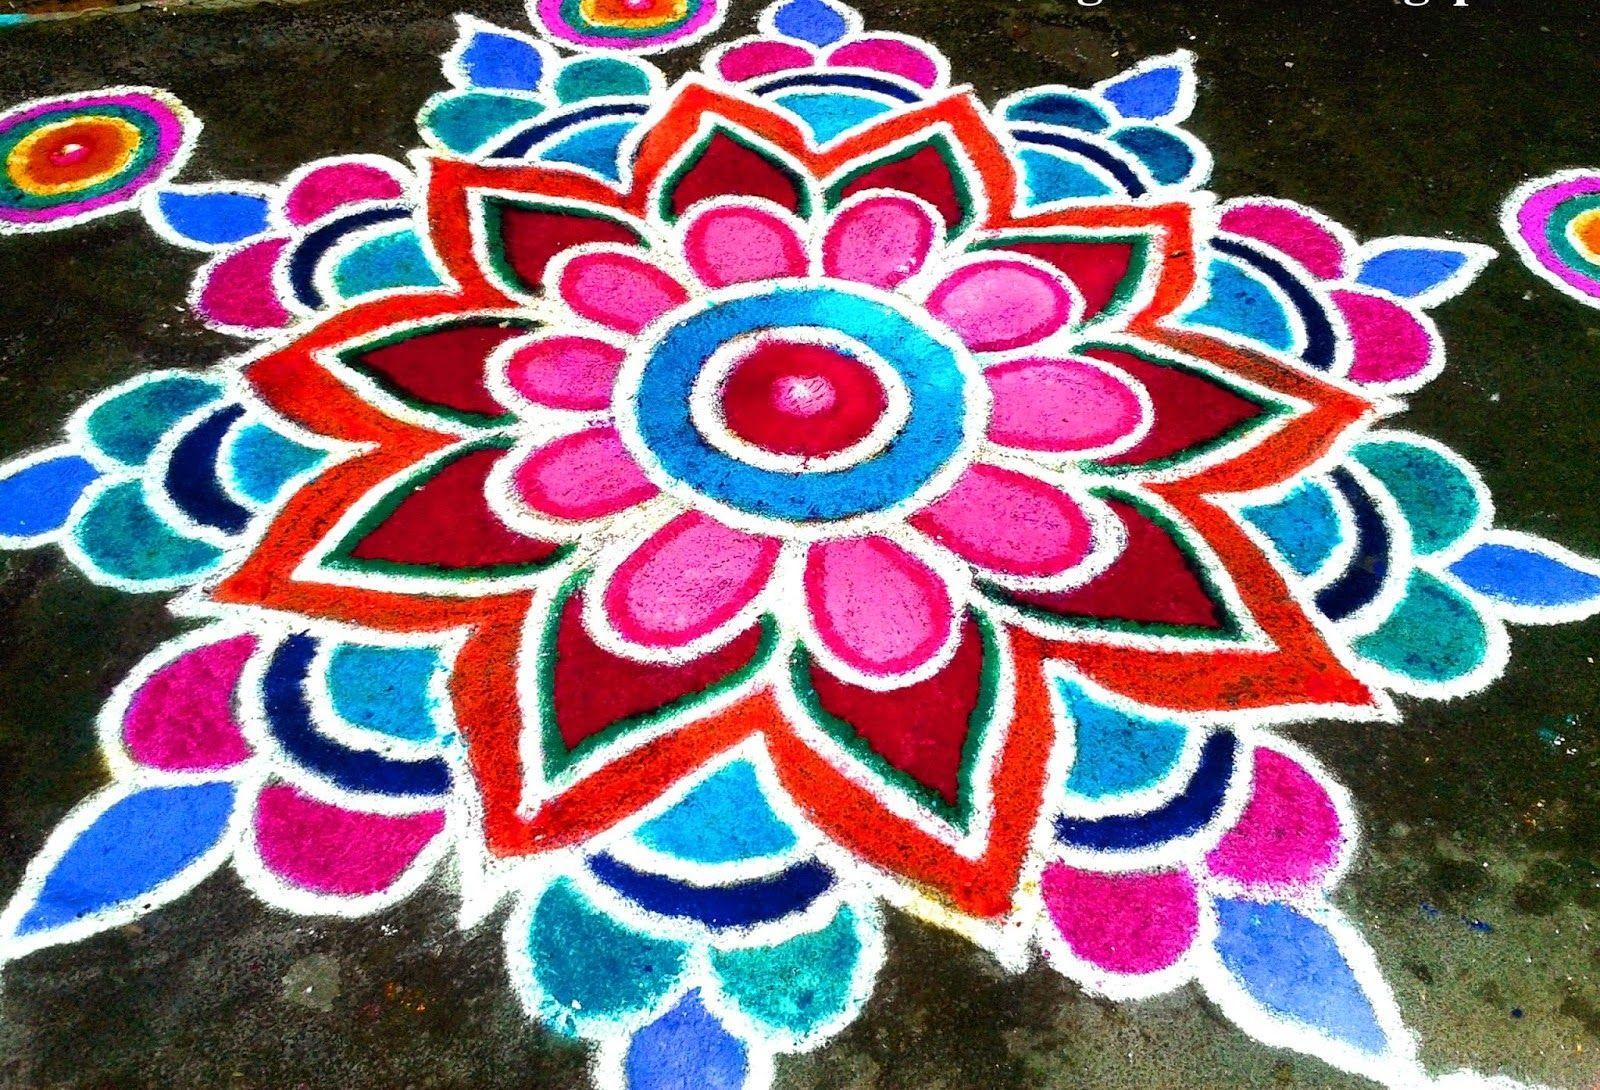 rangoli designs for diwali competition - Google Search | beautiful ... for Beautiful Rangolis For Competition  186ref